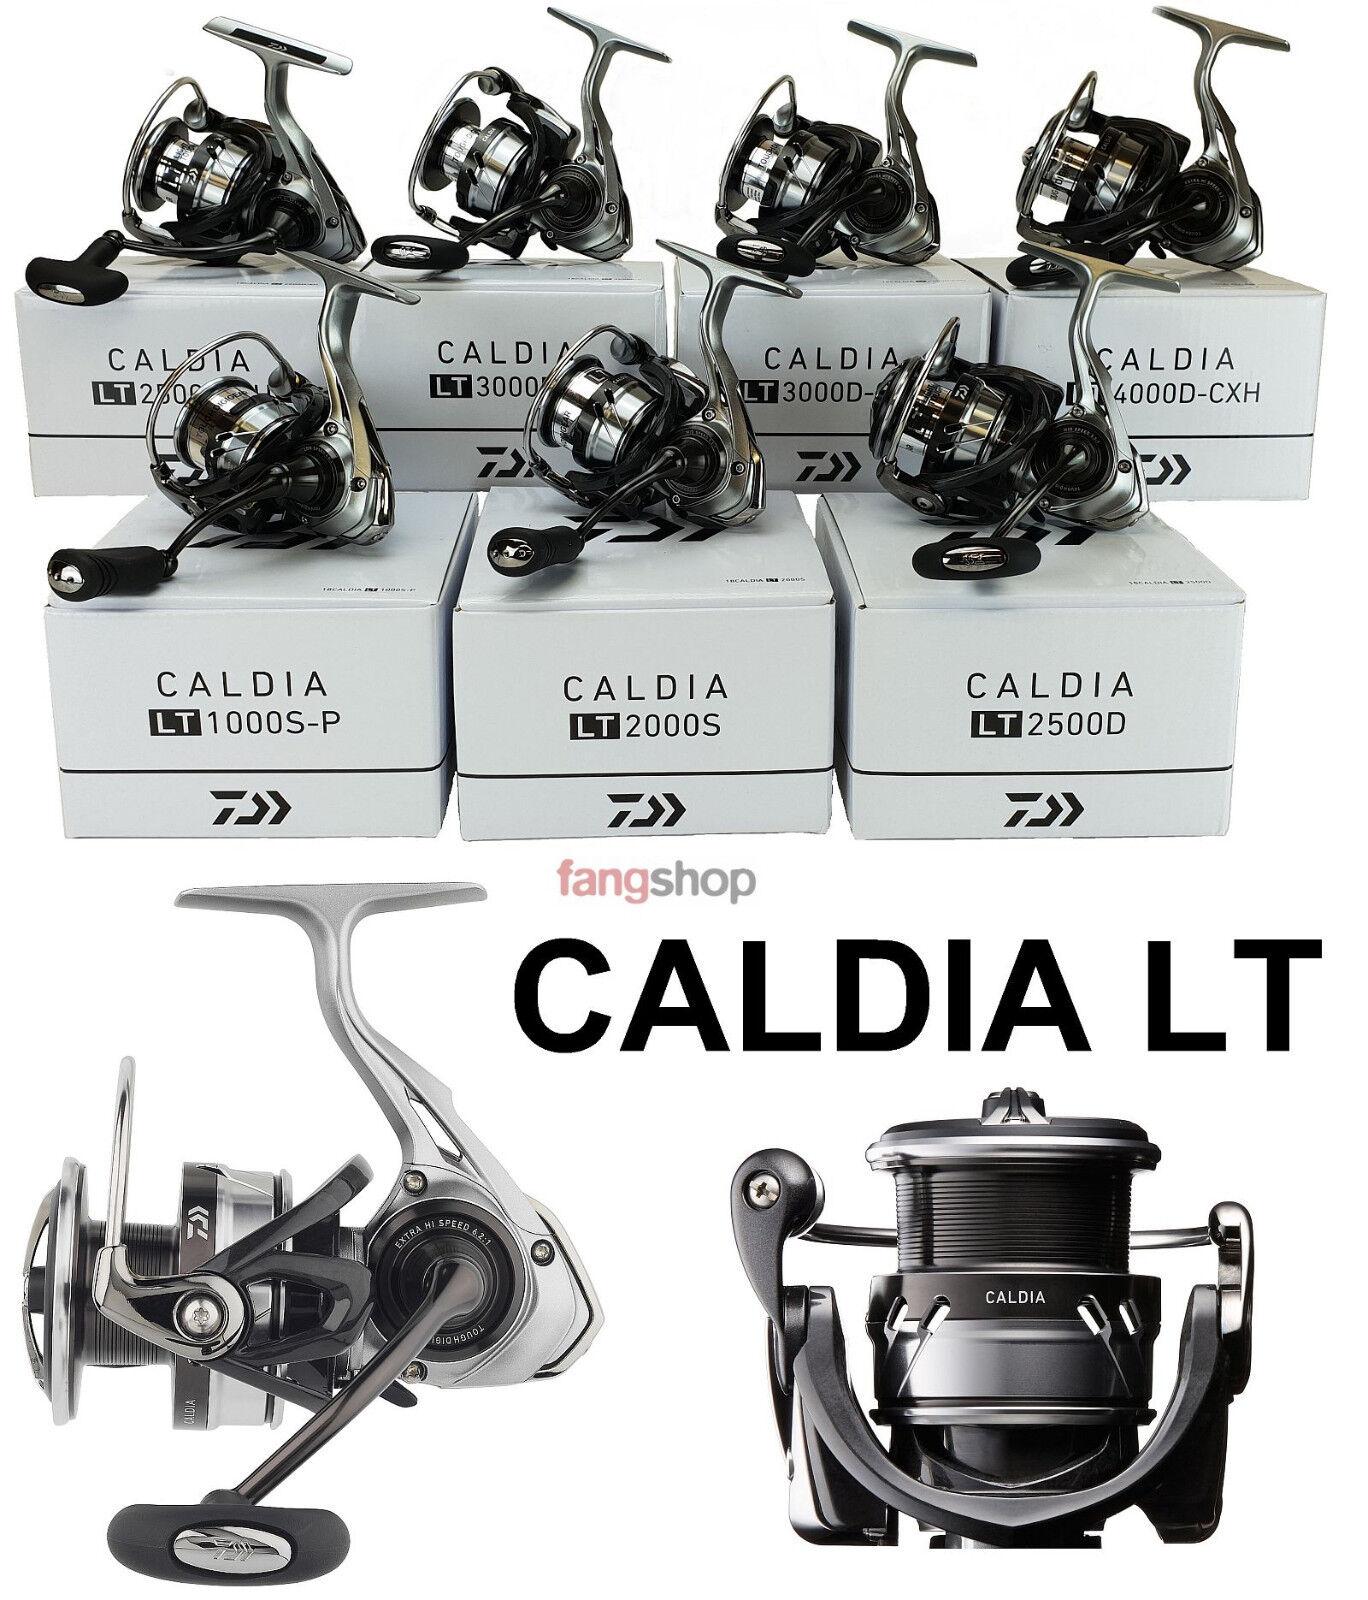 Daiwa CALDIA extrem LT extrem CALDIA leichte Angelrolle 1000 2000 2500 3000 4000 5000 6000 f51db6